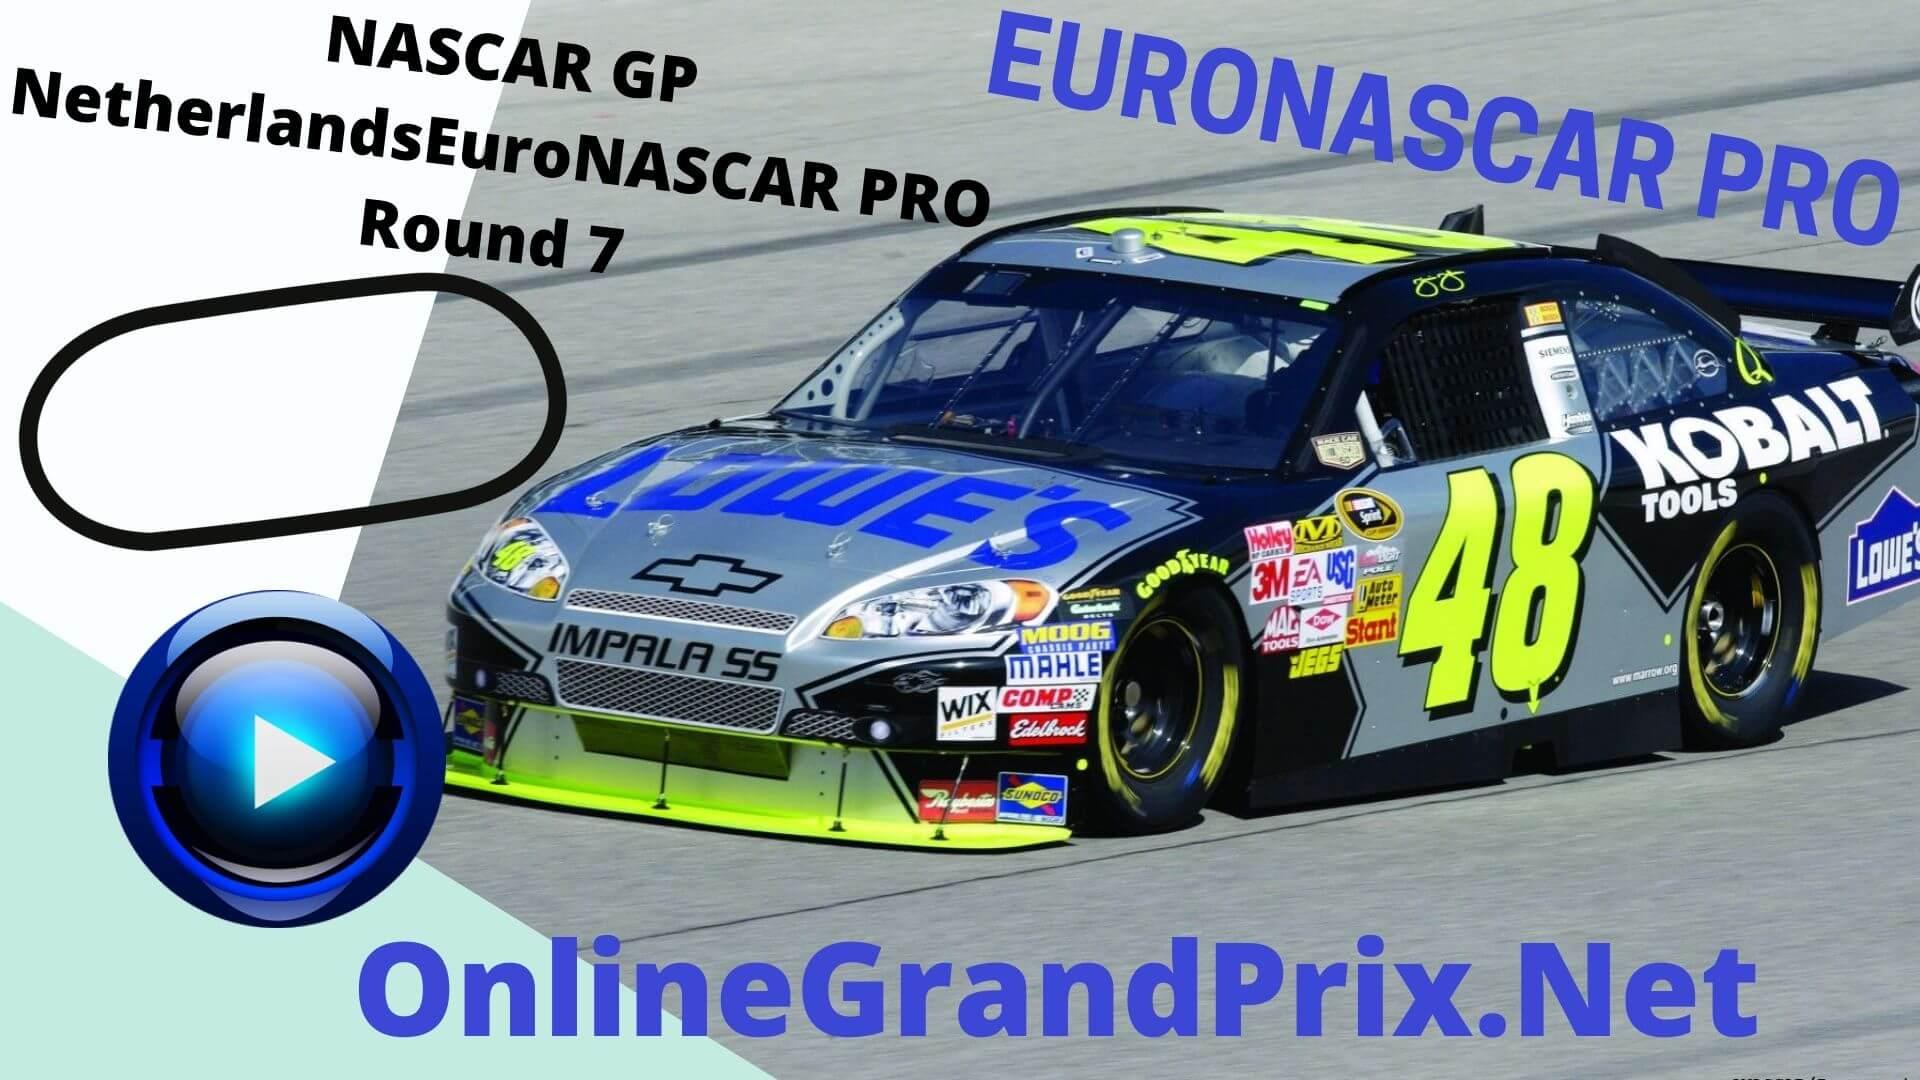 Netherlands NASCAR GP Live Stream | Euro NASCAR PRO Round 7